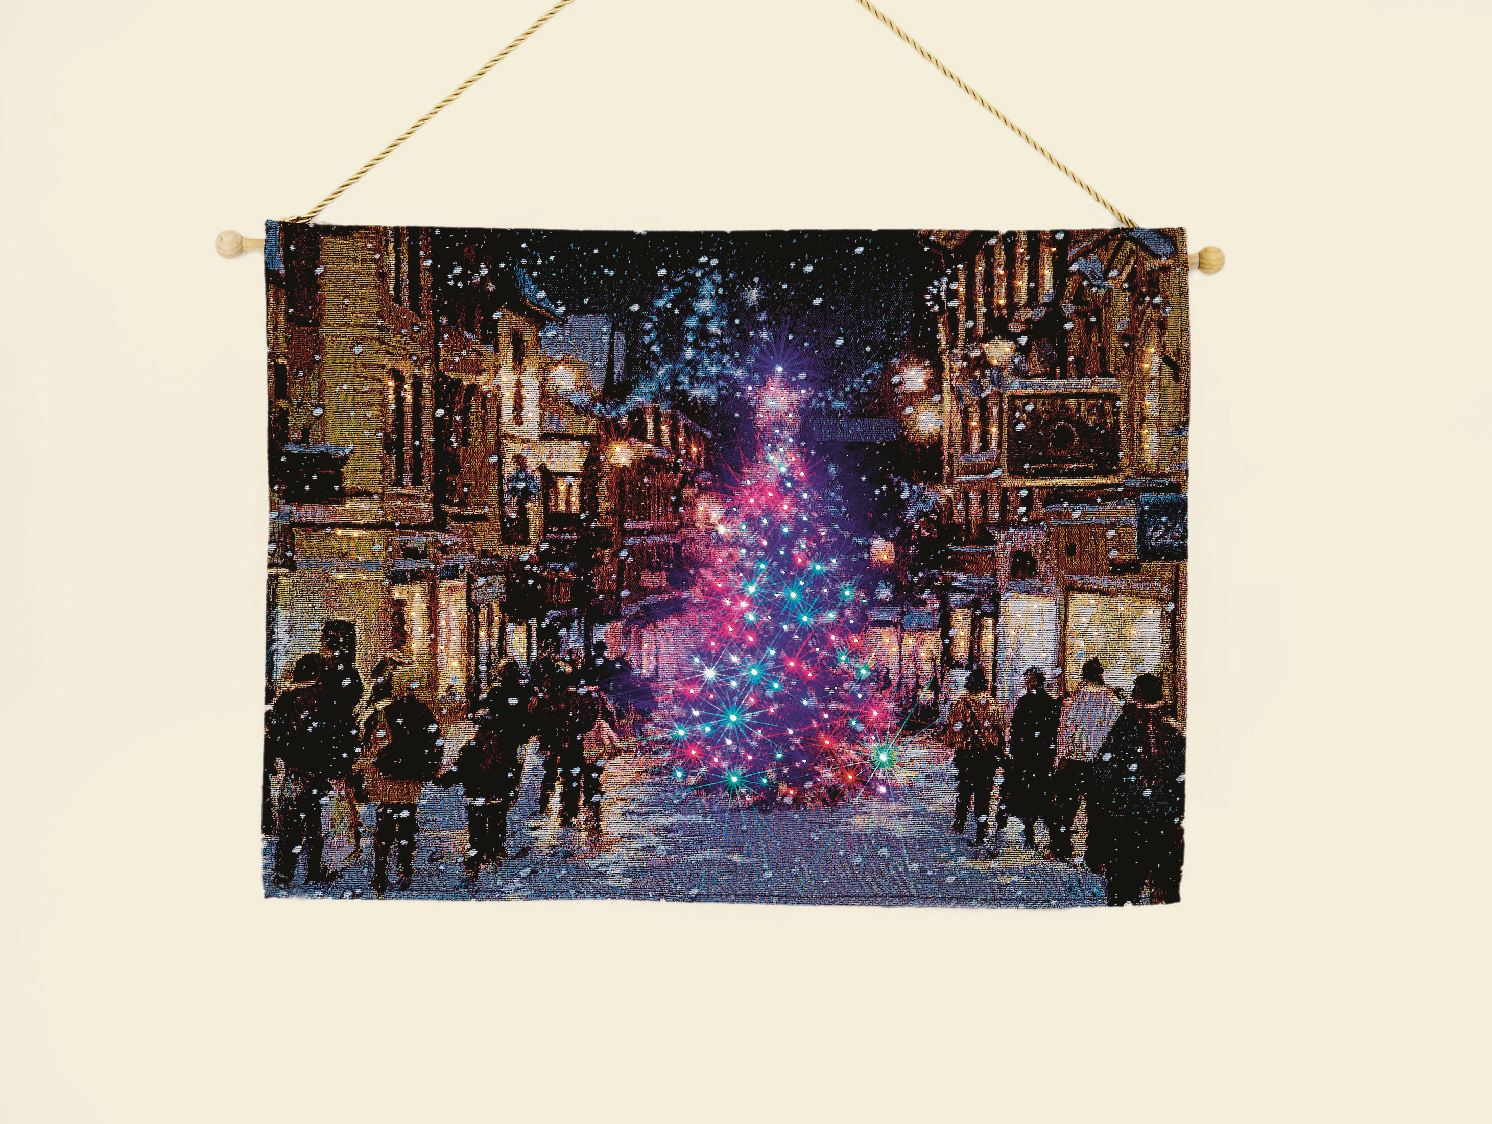 Xmas Christmas Tapestry Hanging Wall Art Led Fibre Optic